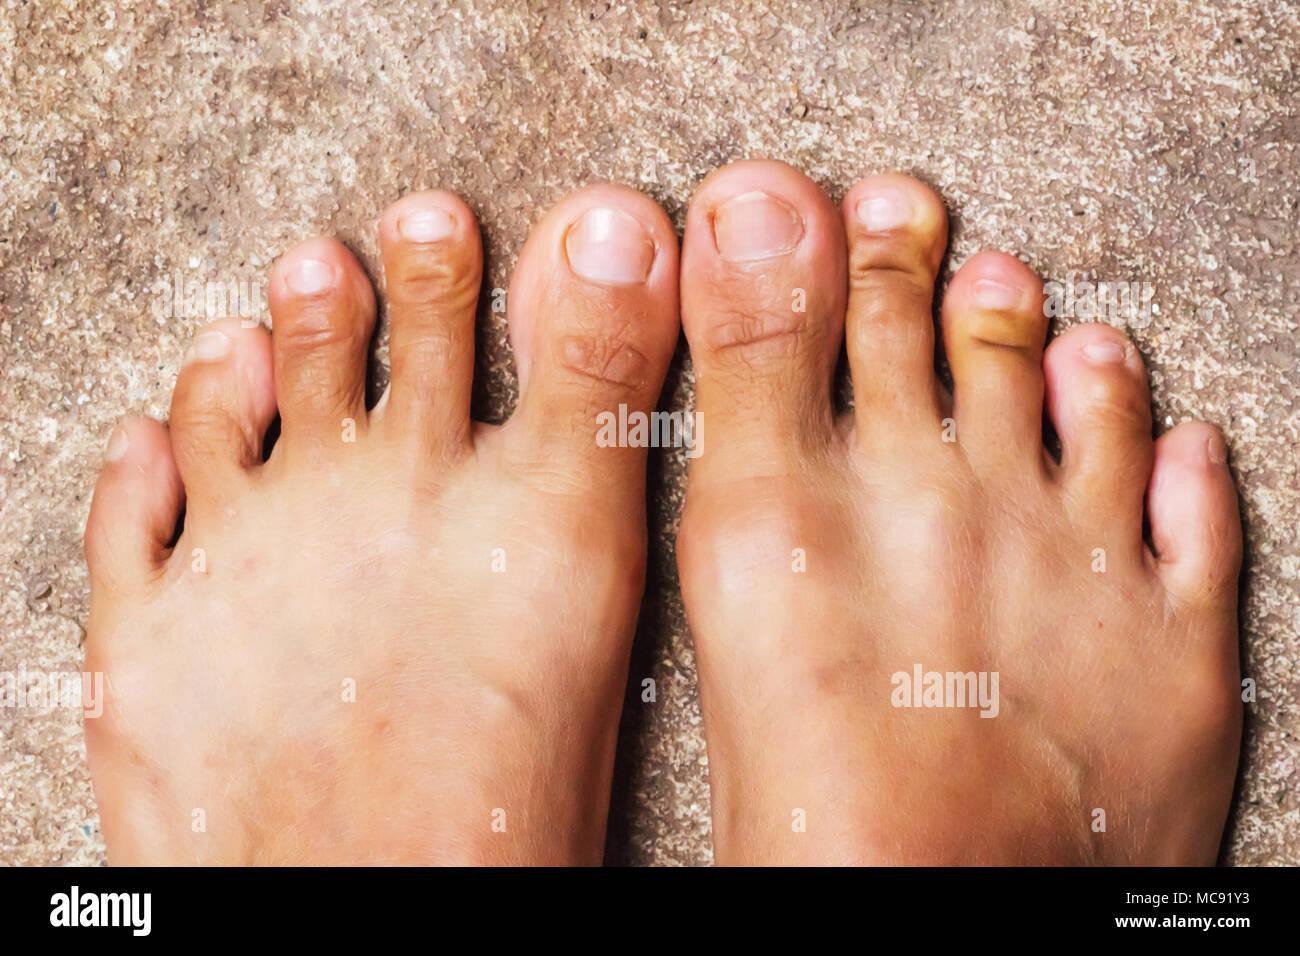 Foot, Rheumatoid foot disease background. - Stock Image